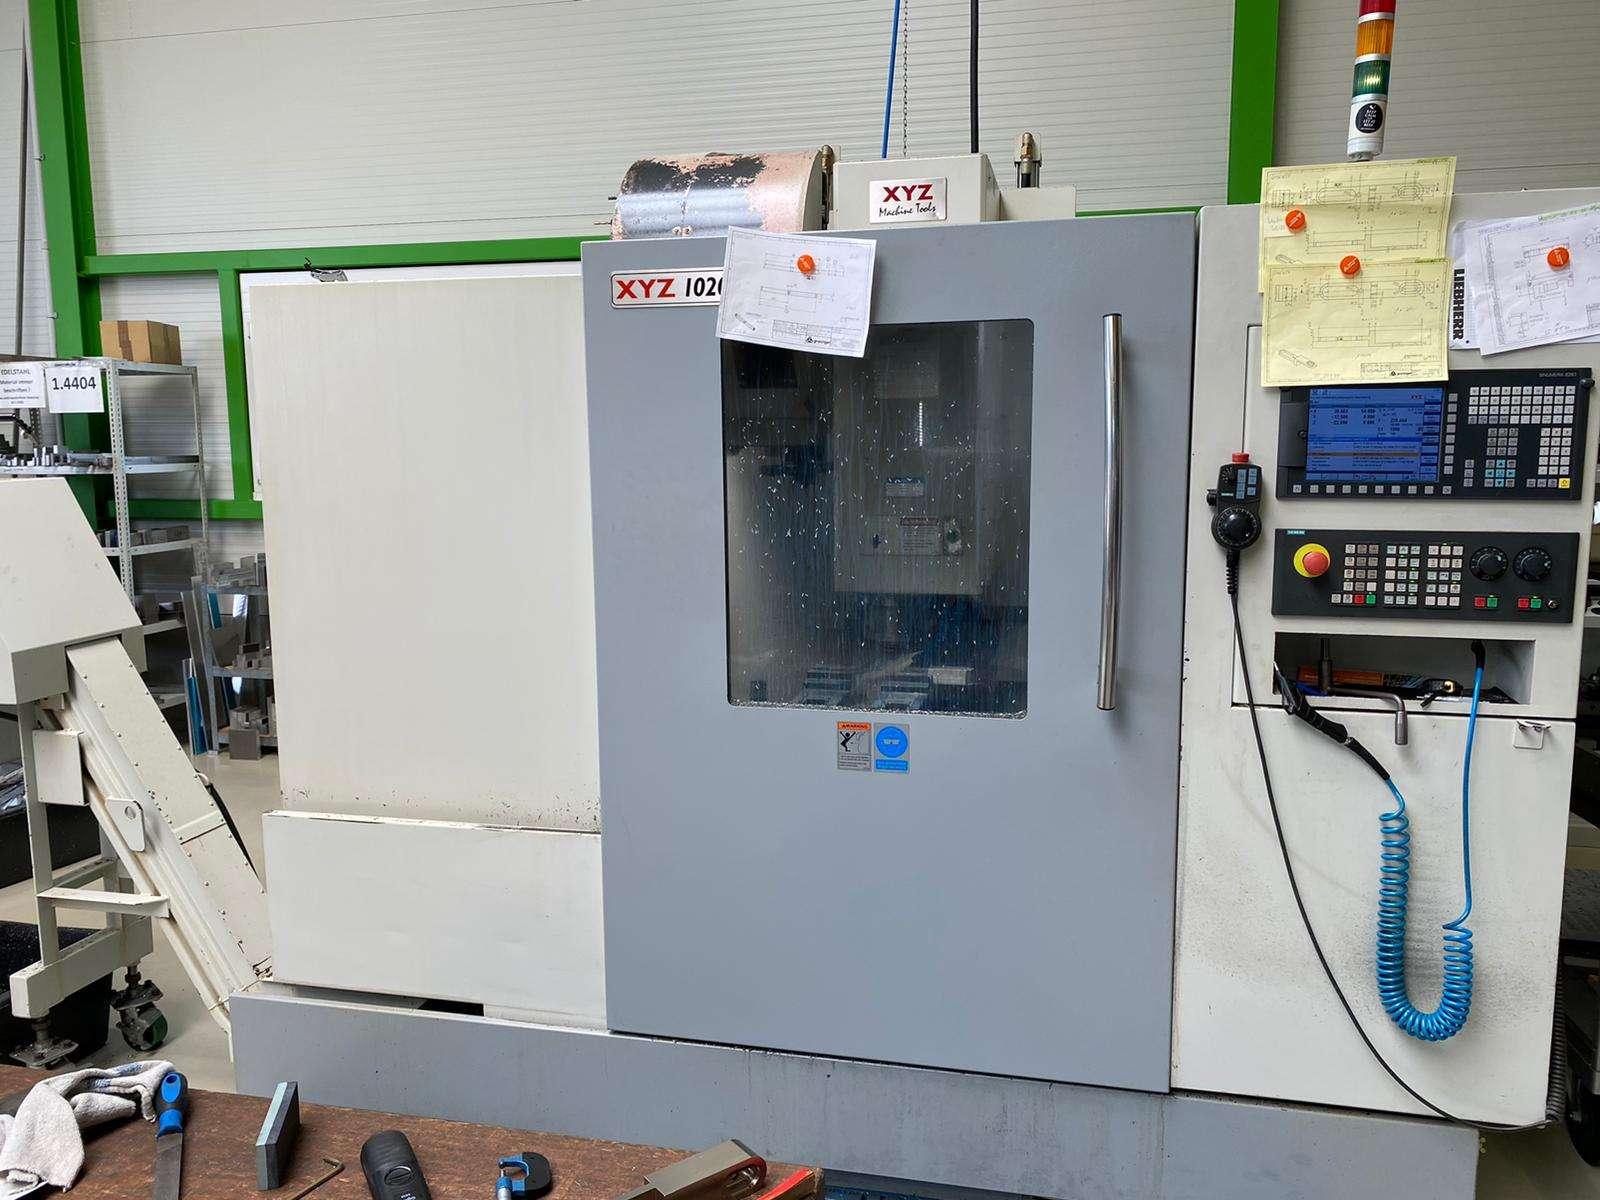 XYZ Machine Tools 1020 VMC